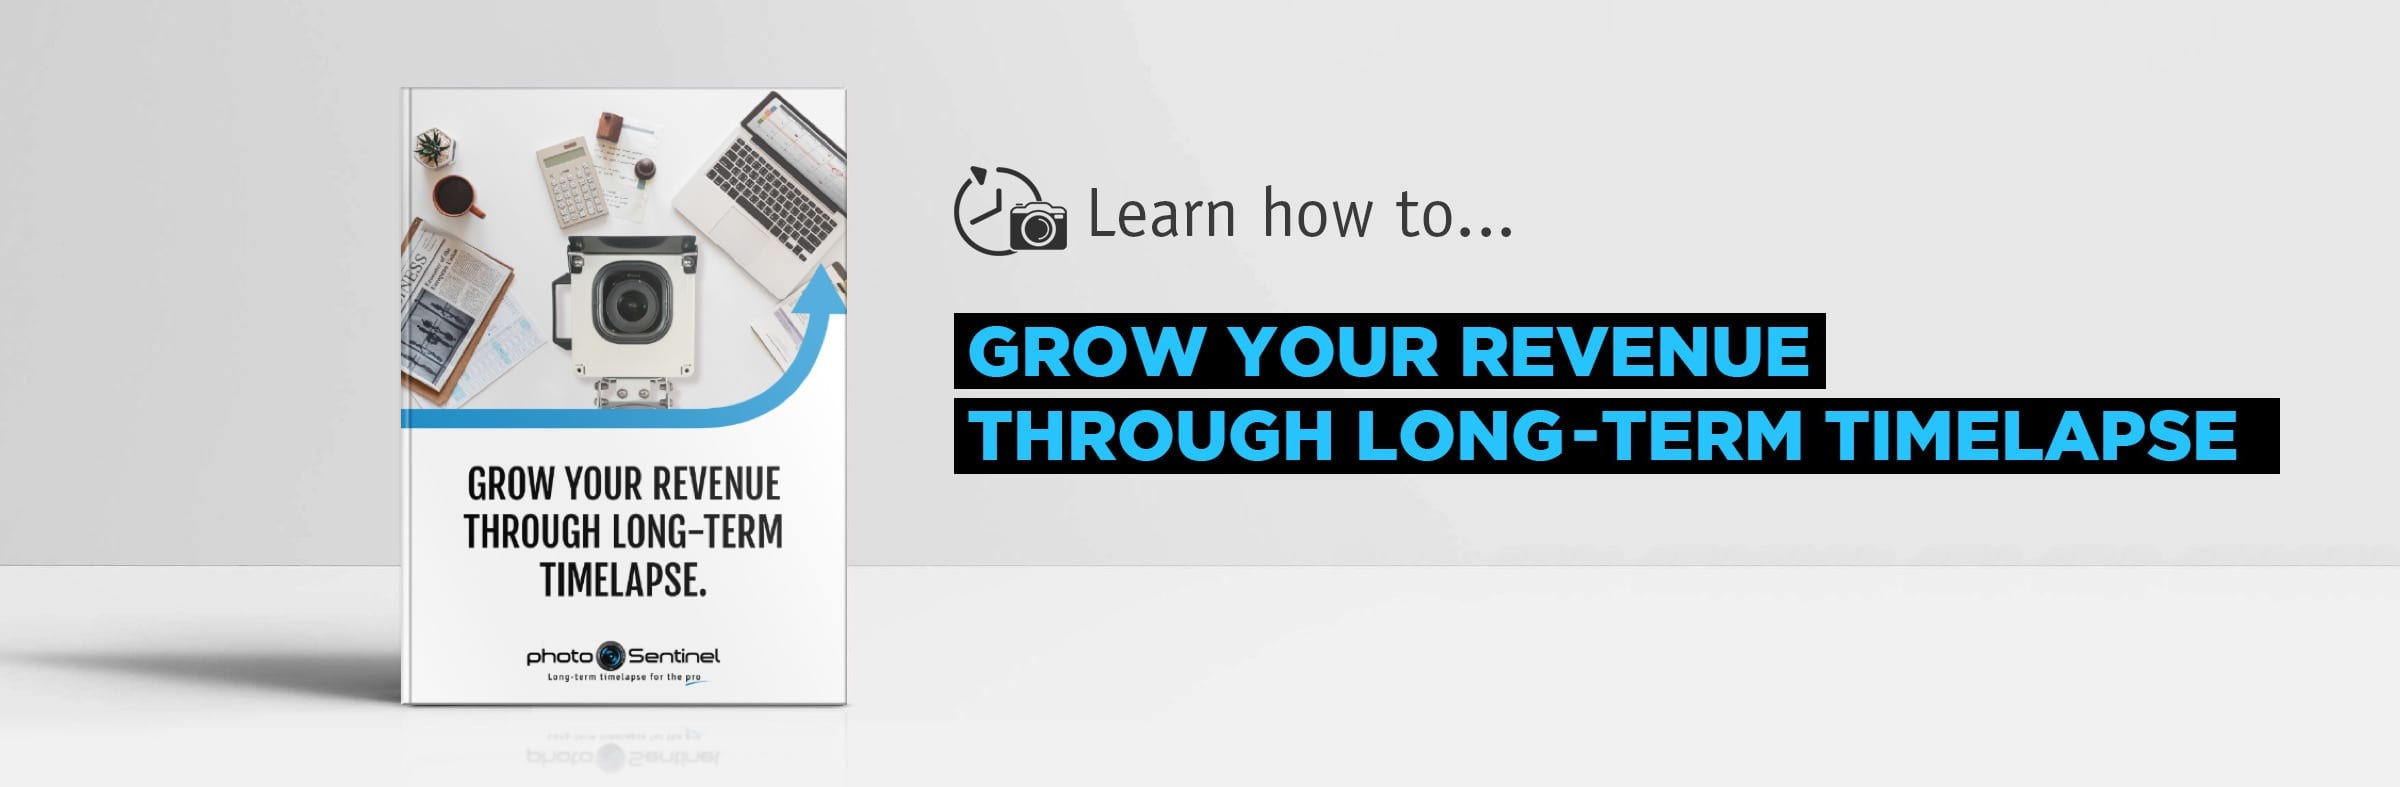 The photoSentinel eBook 'Grow Your Revenue Through Long-Term Timelapse'